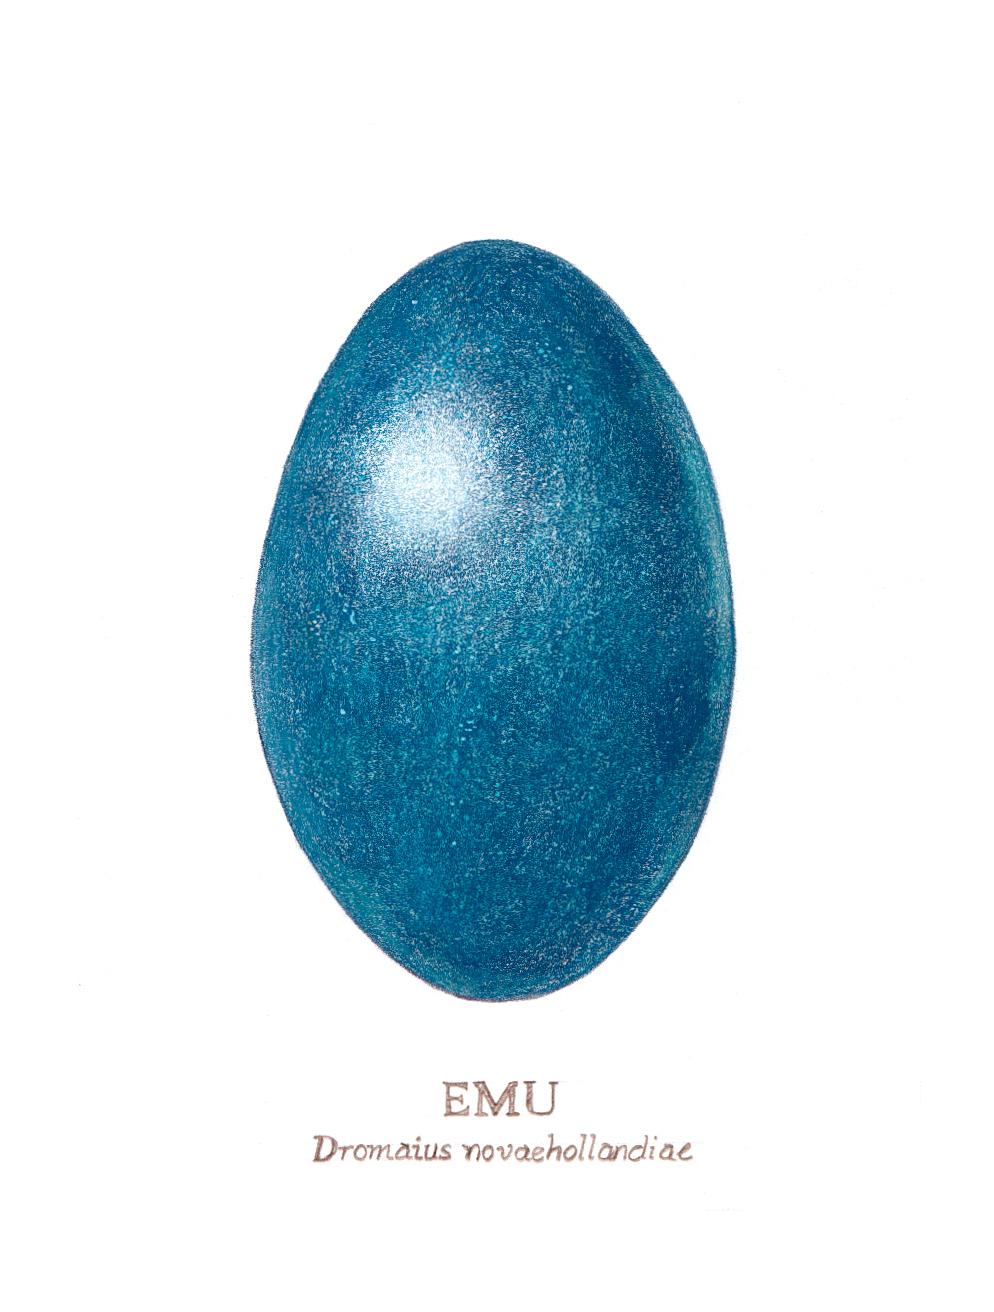 EmuEggNoOutline.jpg